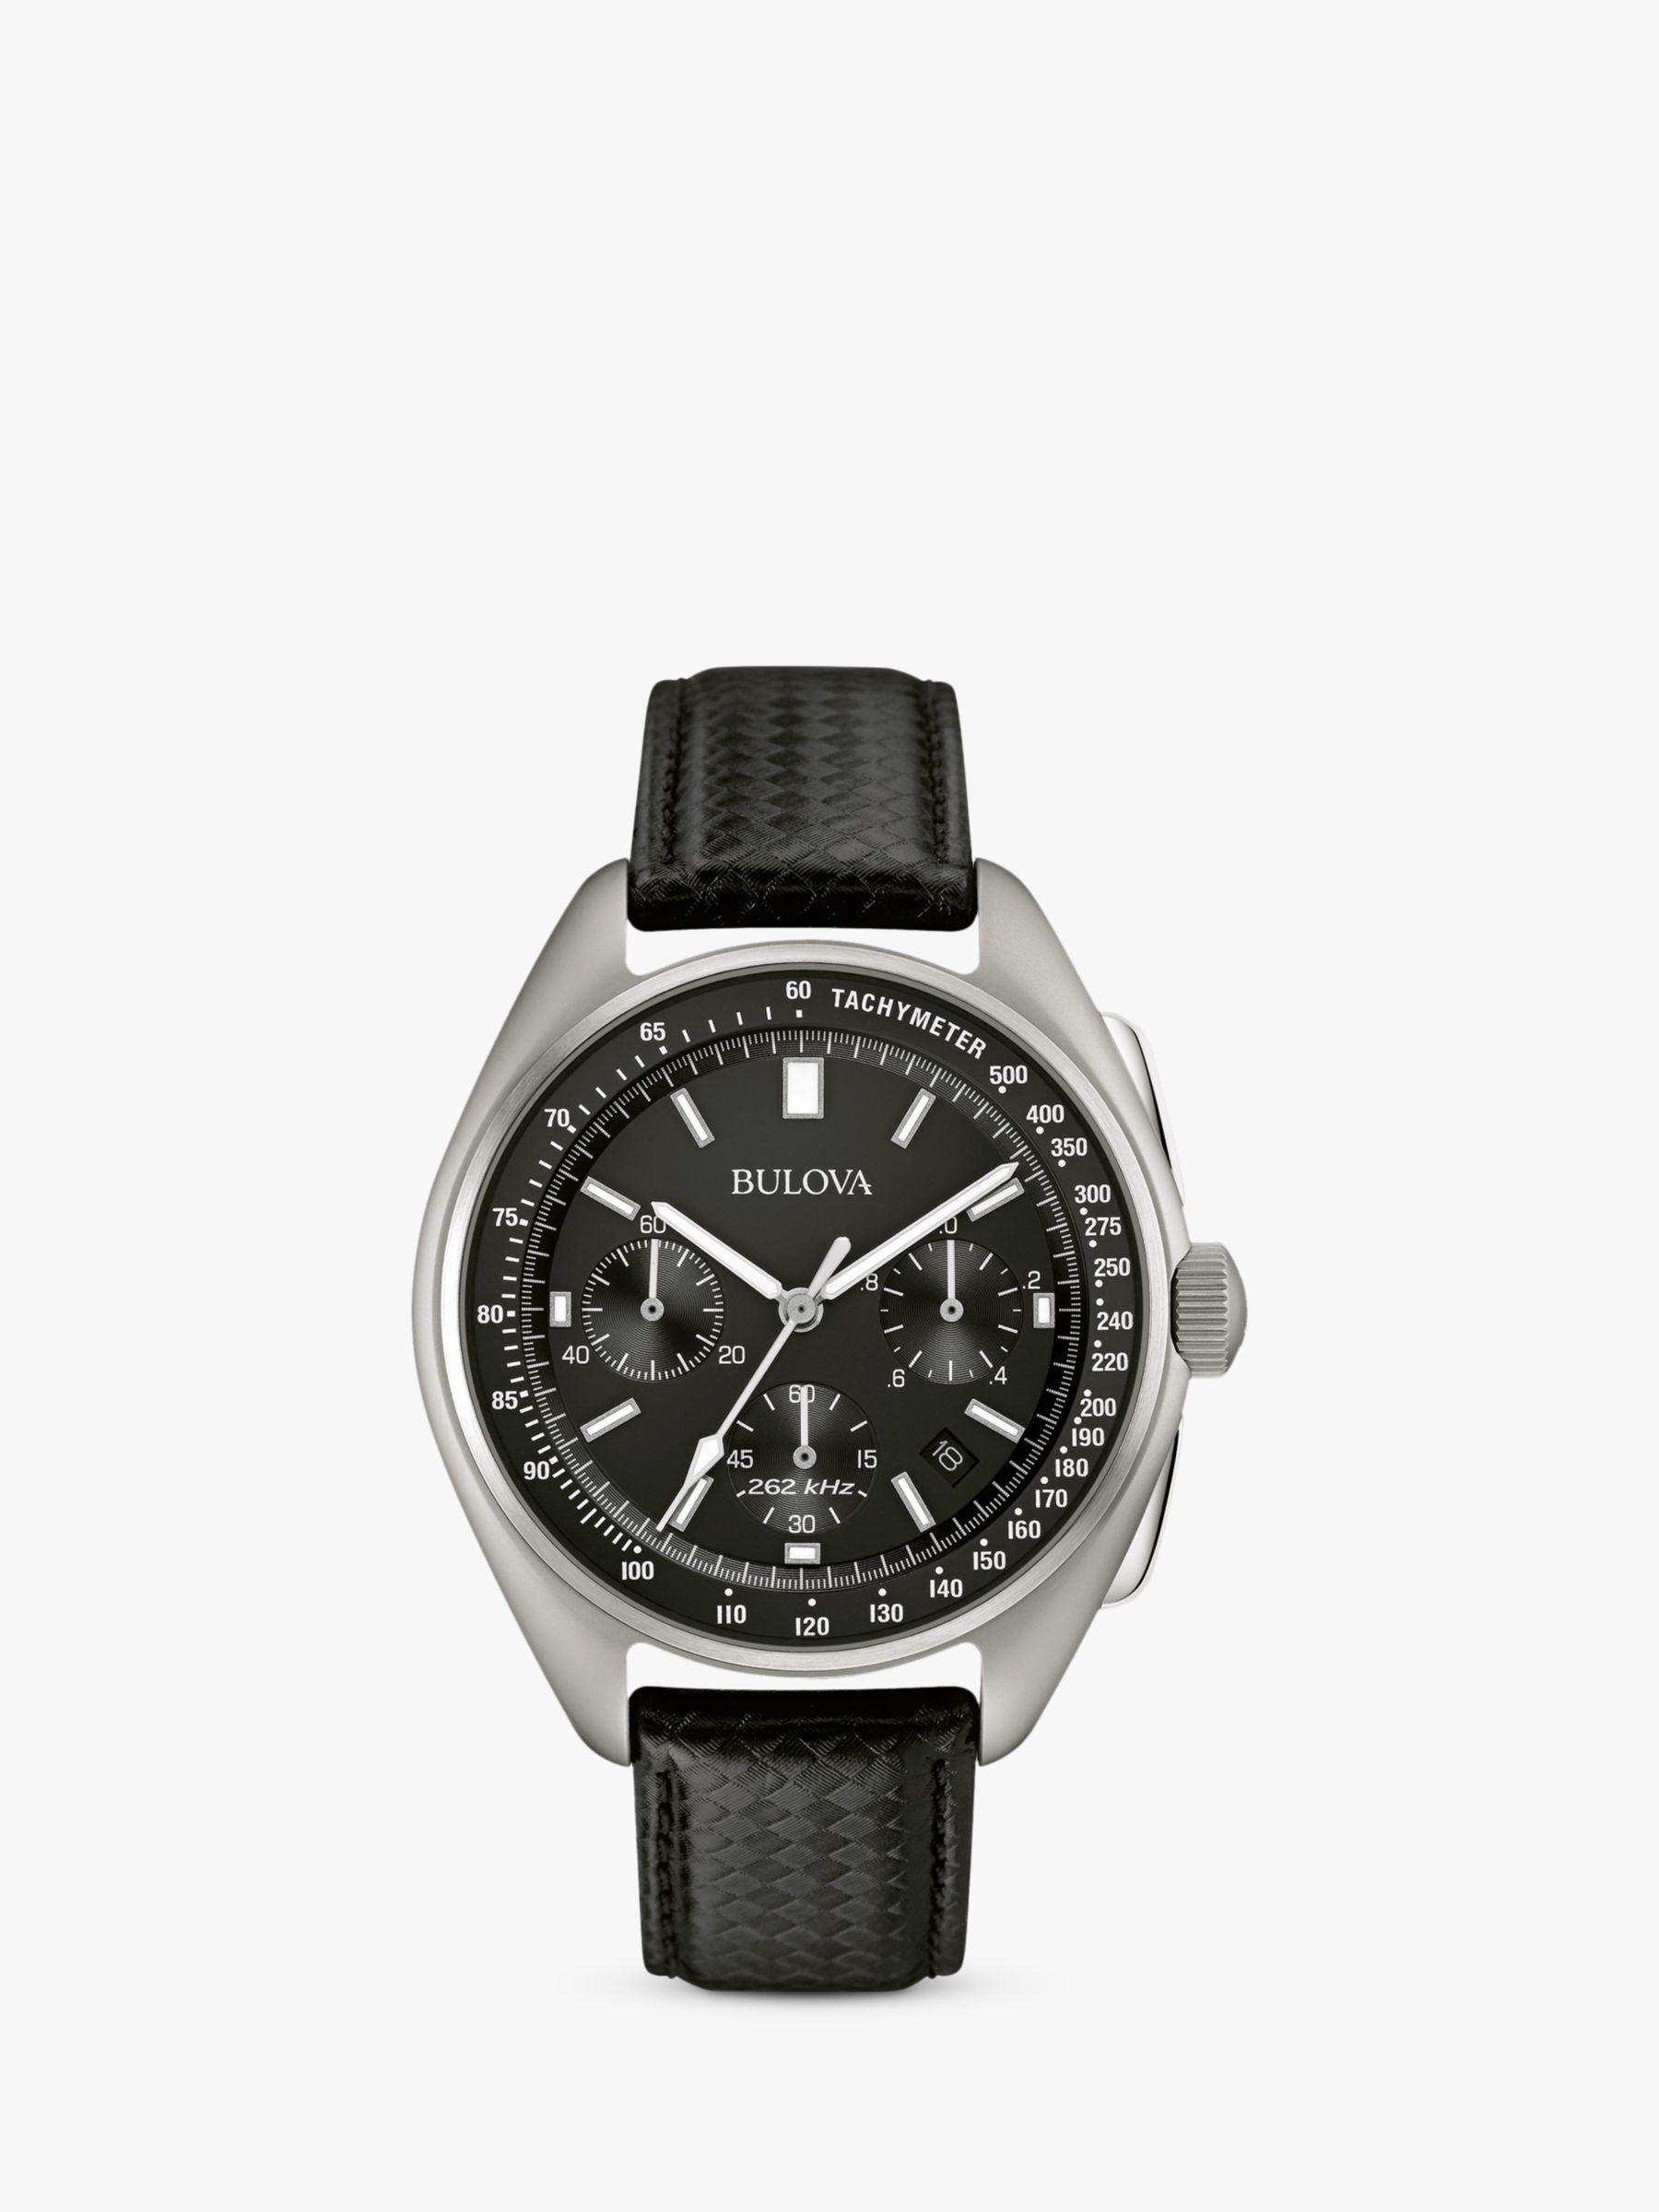 Bulova Bulova 96B251 Men's Special Edition Lunar Pilot Date Chronograph Leather Strap Watch, Black